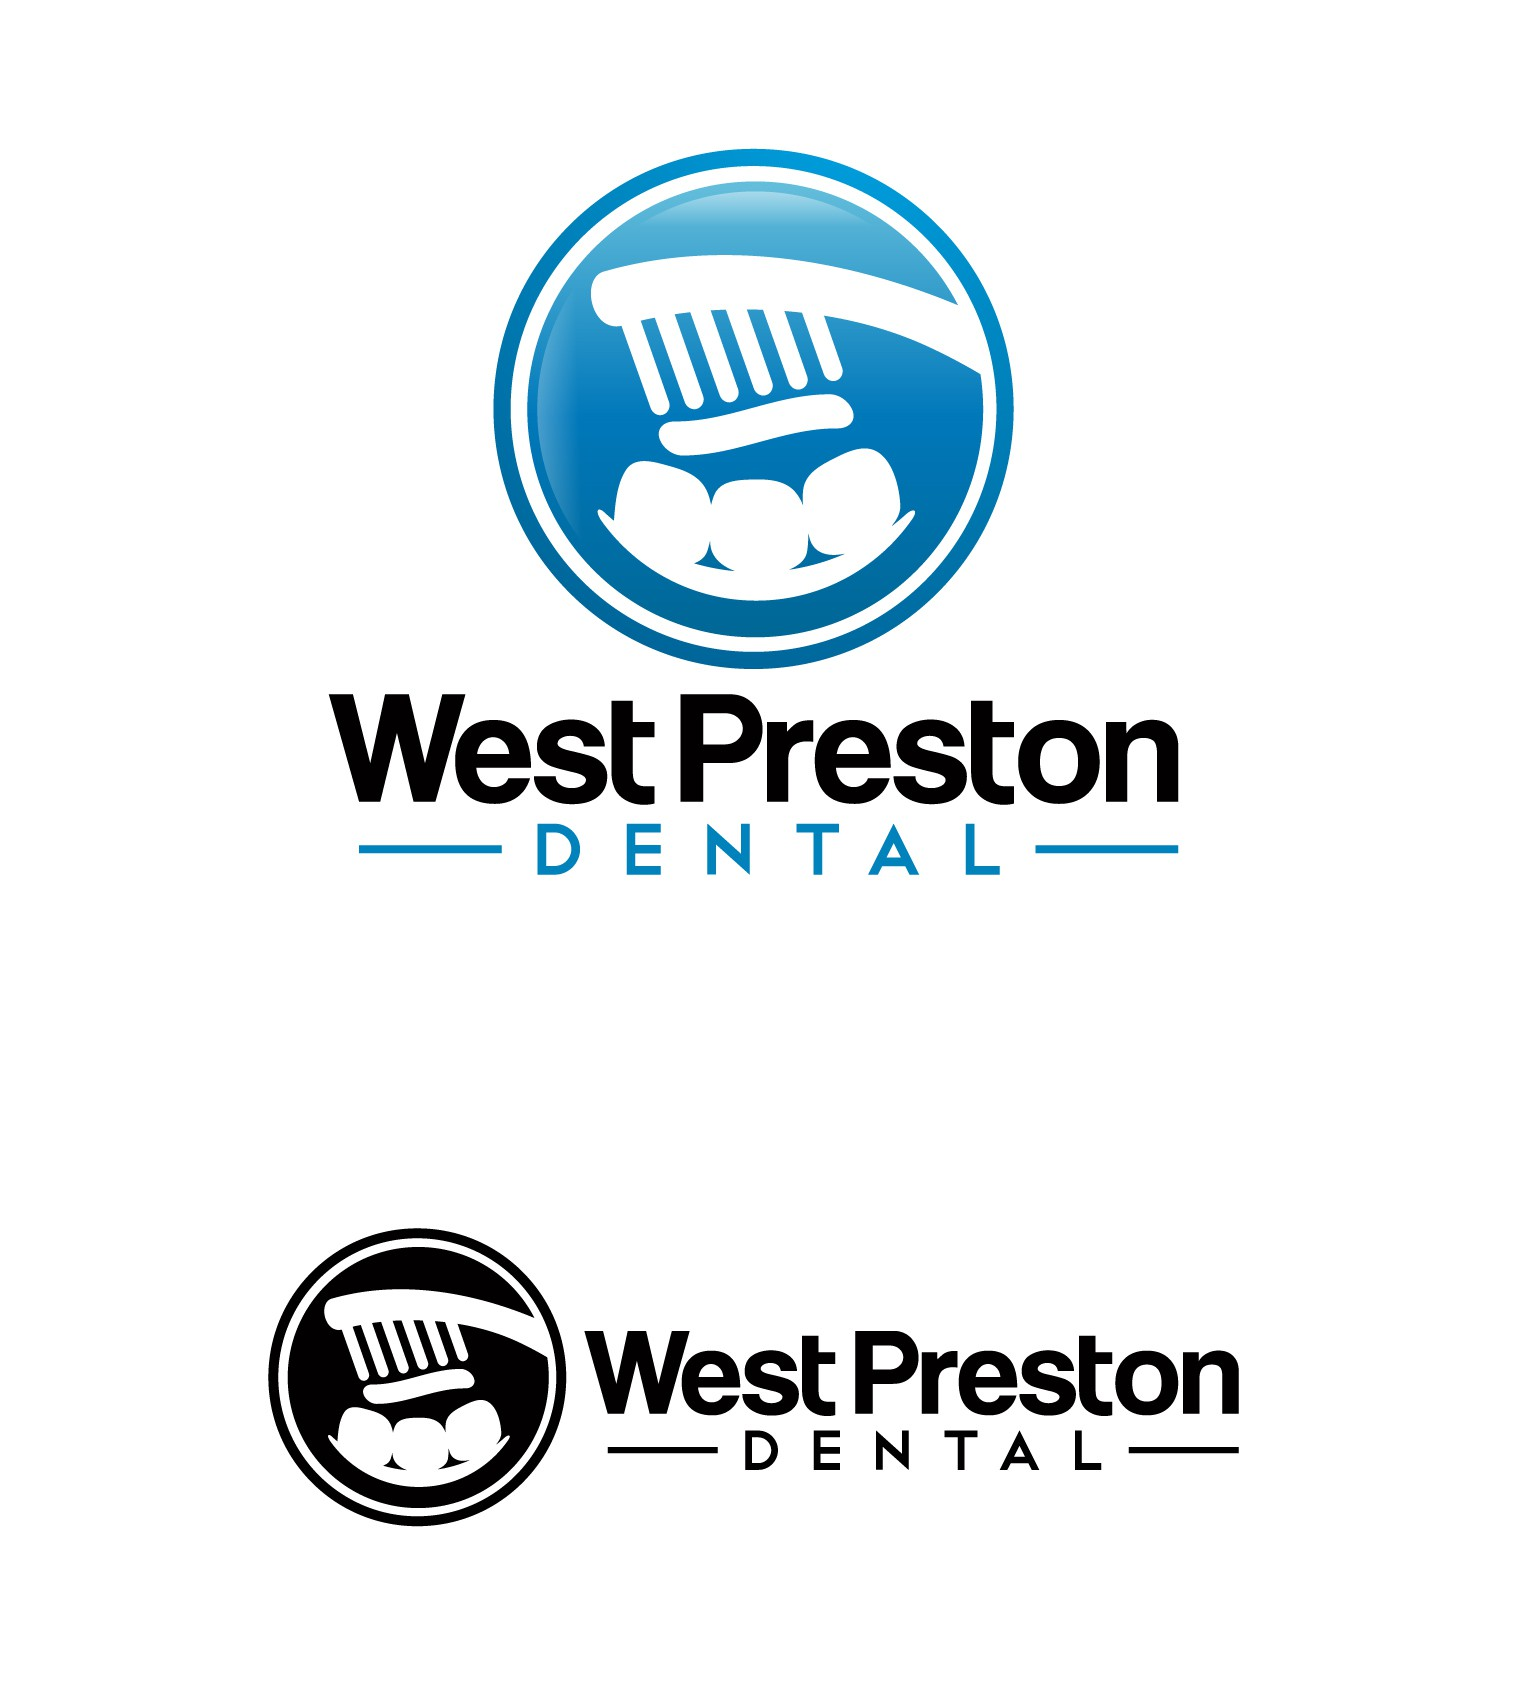 West Preston Dental needs a new logo